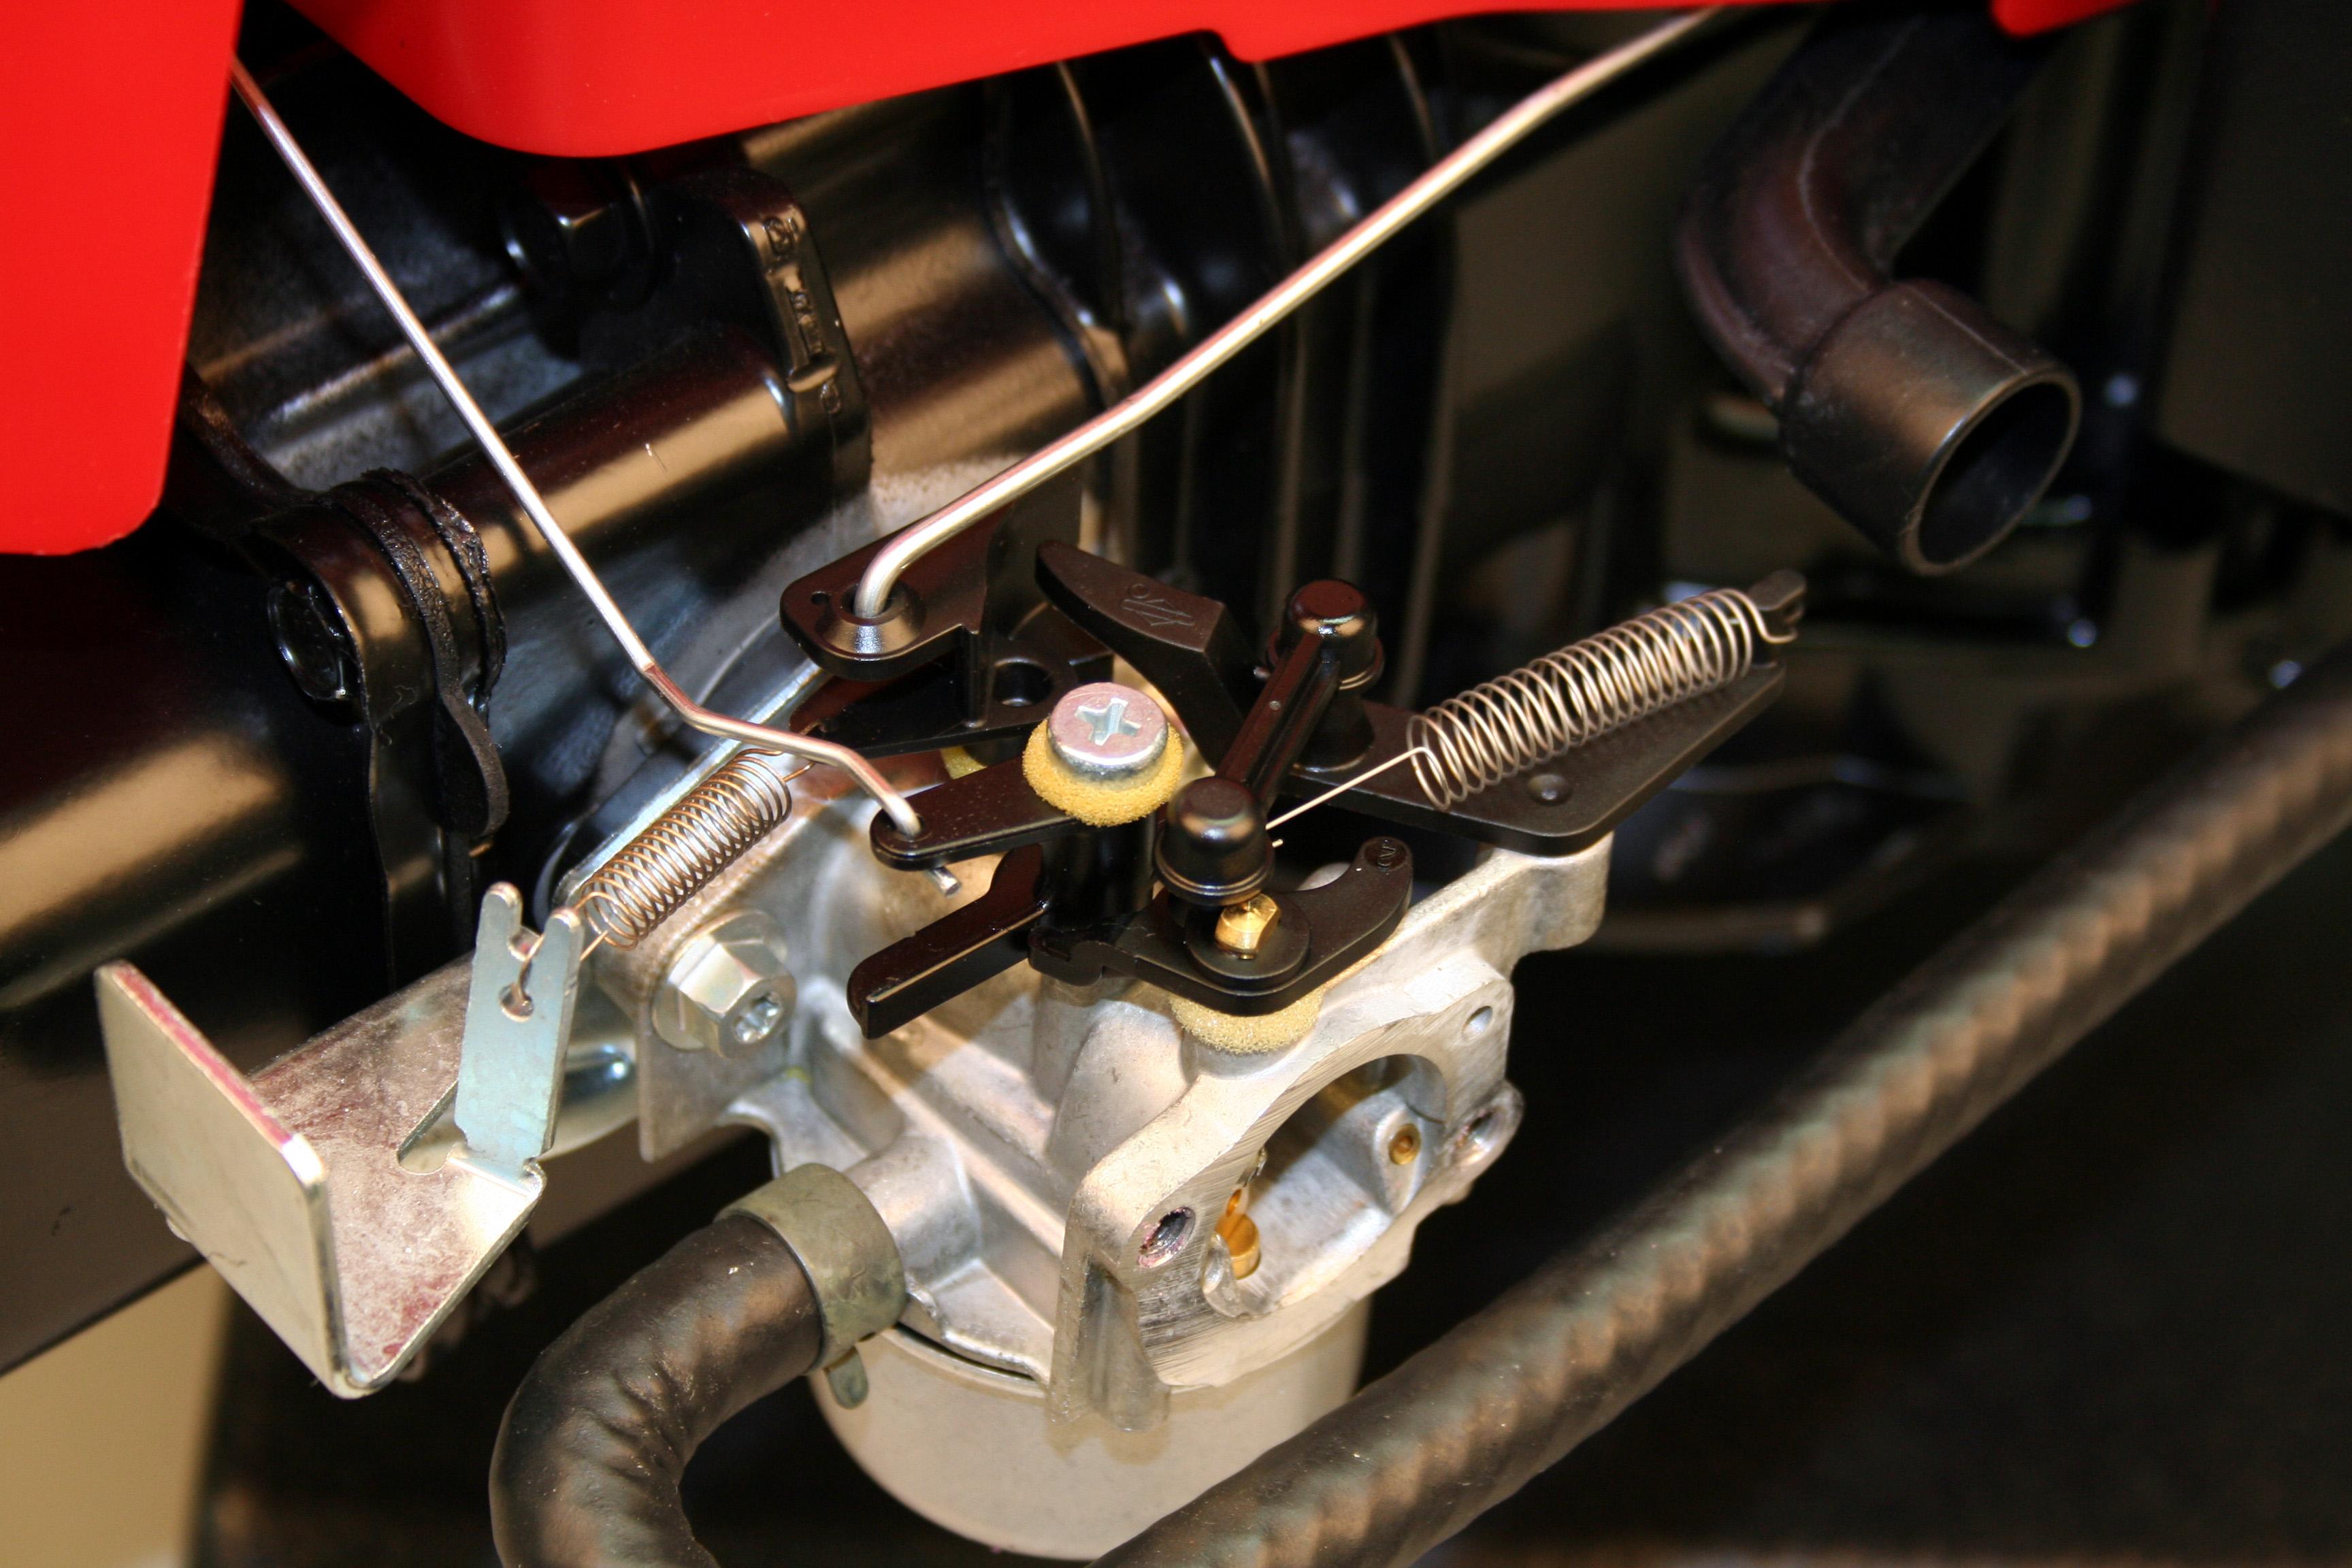 Quia - Small Engine Certification Reveiw flash cards